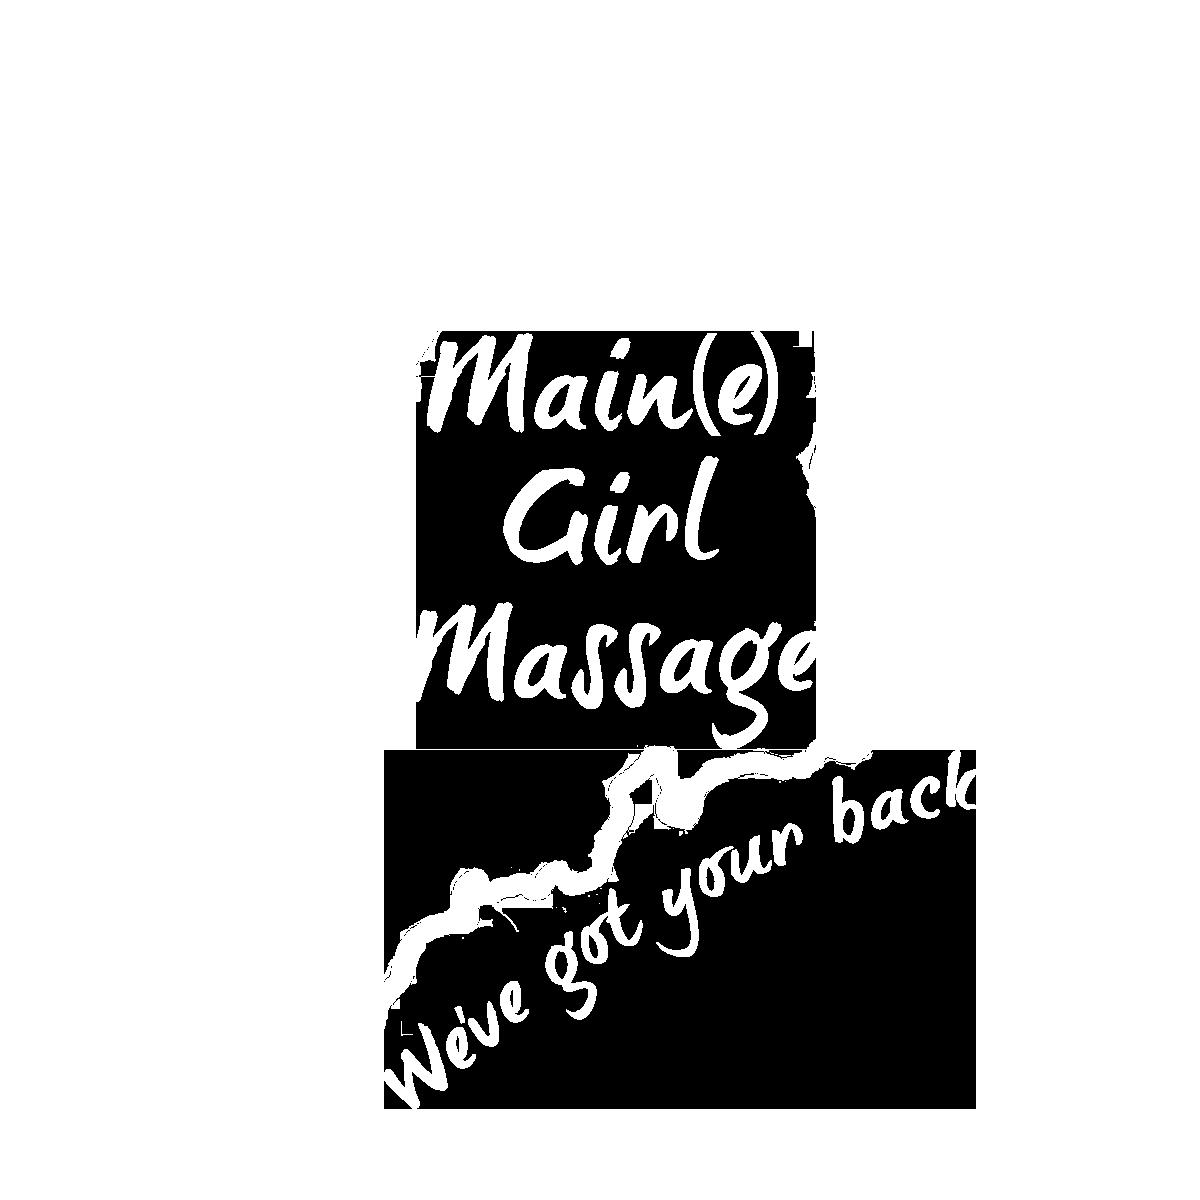 Main(e) Girl Massage